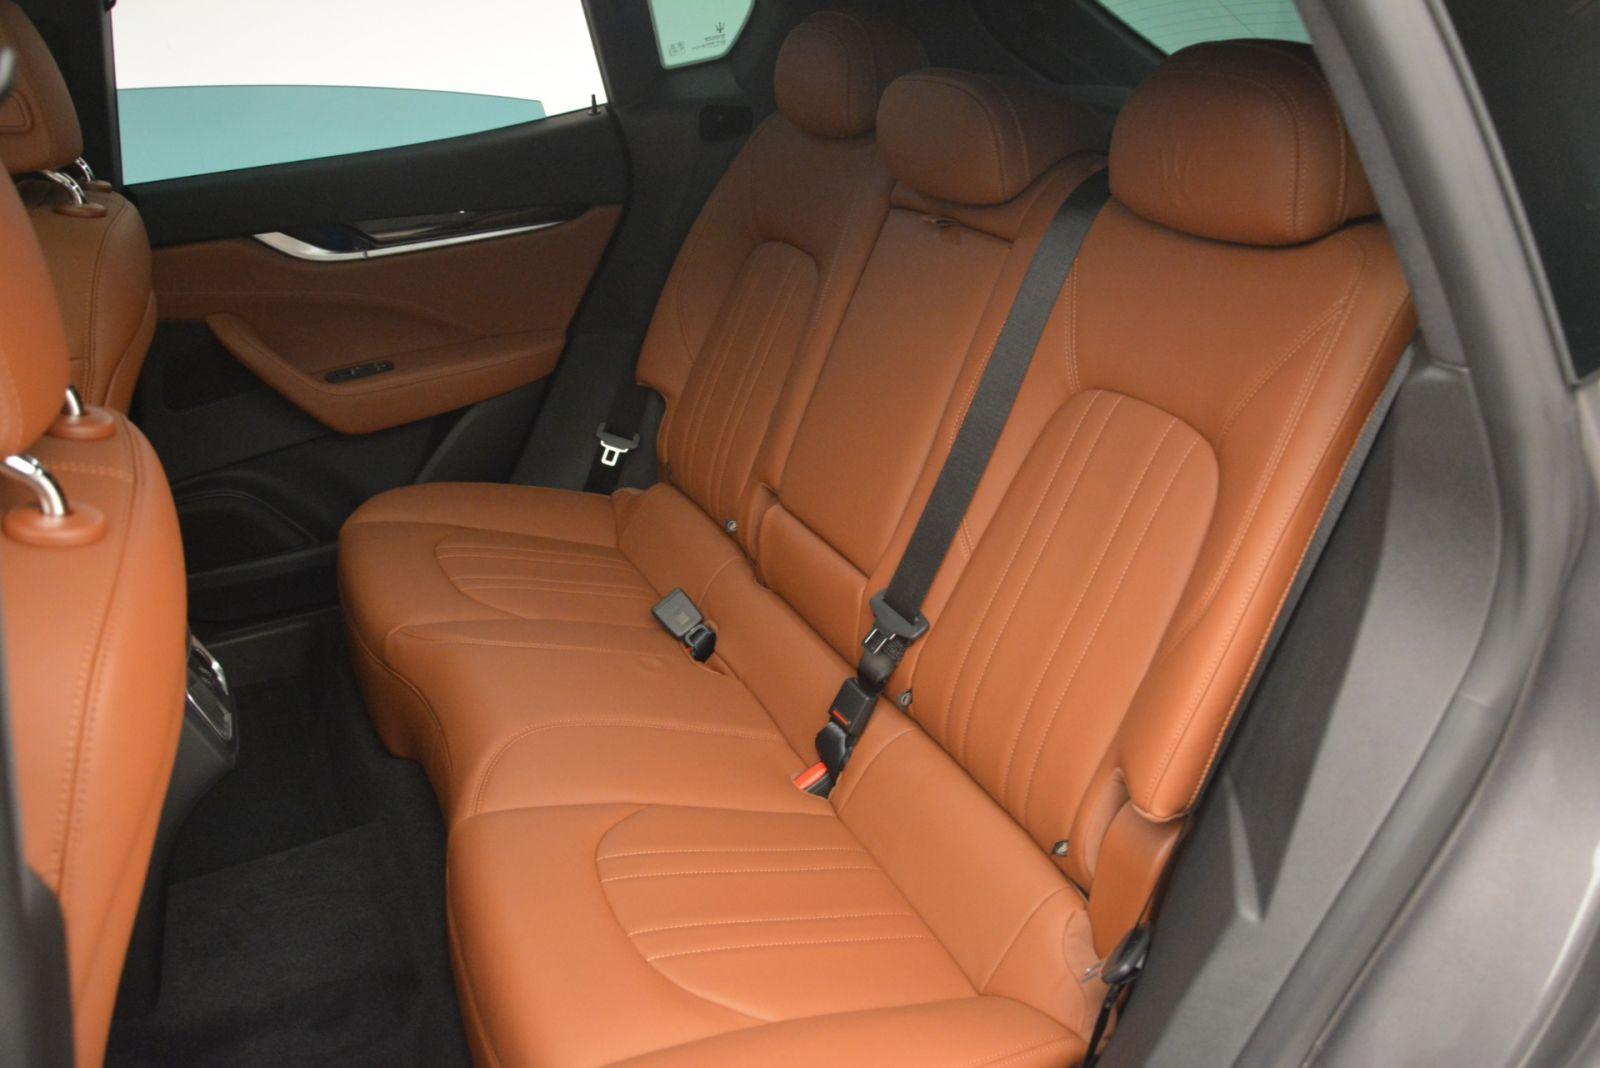 Maserati Levante 5 Chỗ Đối Thủ Porsche Cayenne 2020 Giá Bao Nhiêu - ghế da bò nâu vàng hàng ghế thứ 2